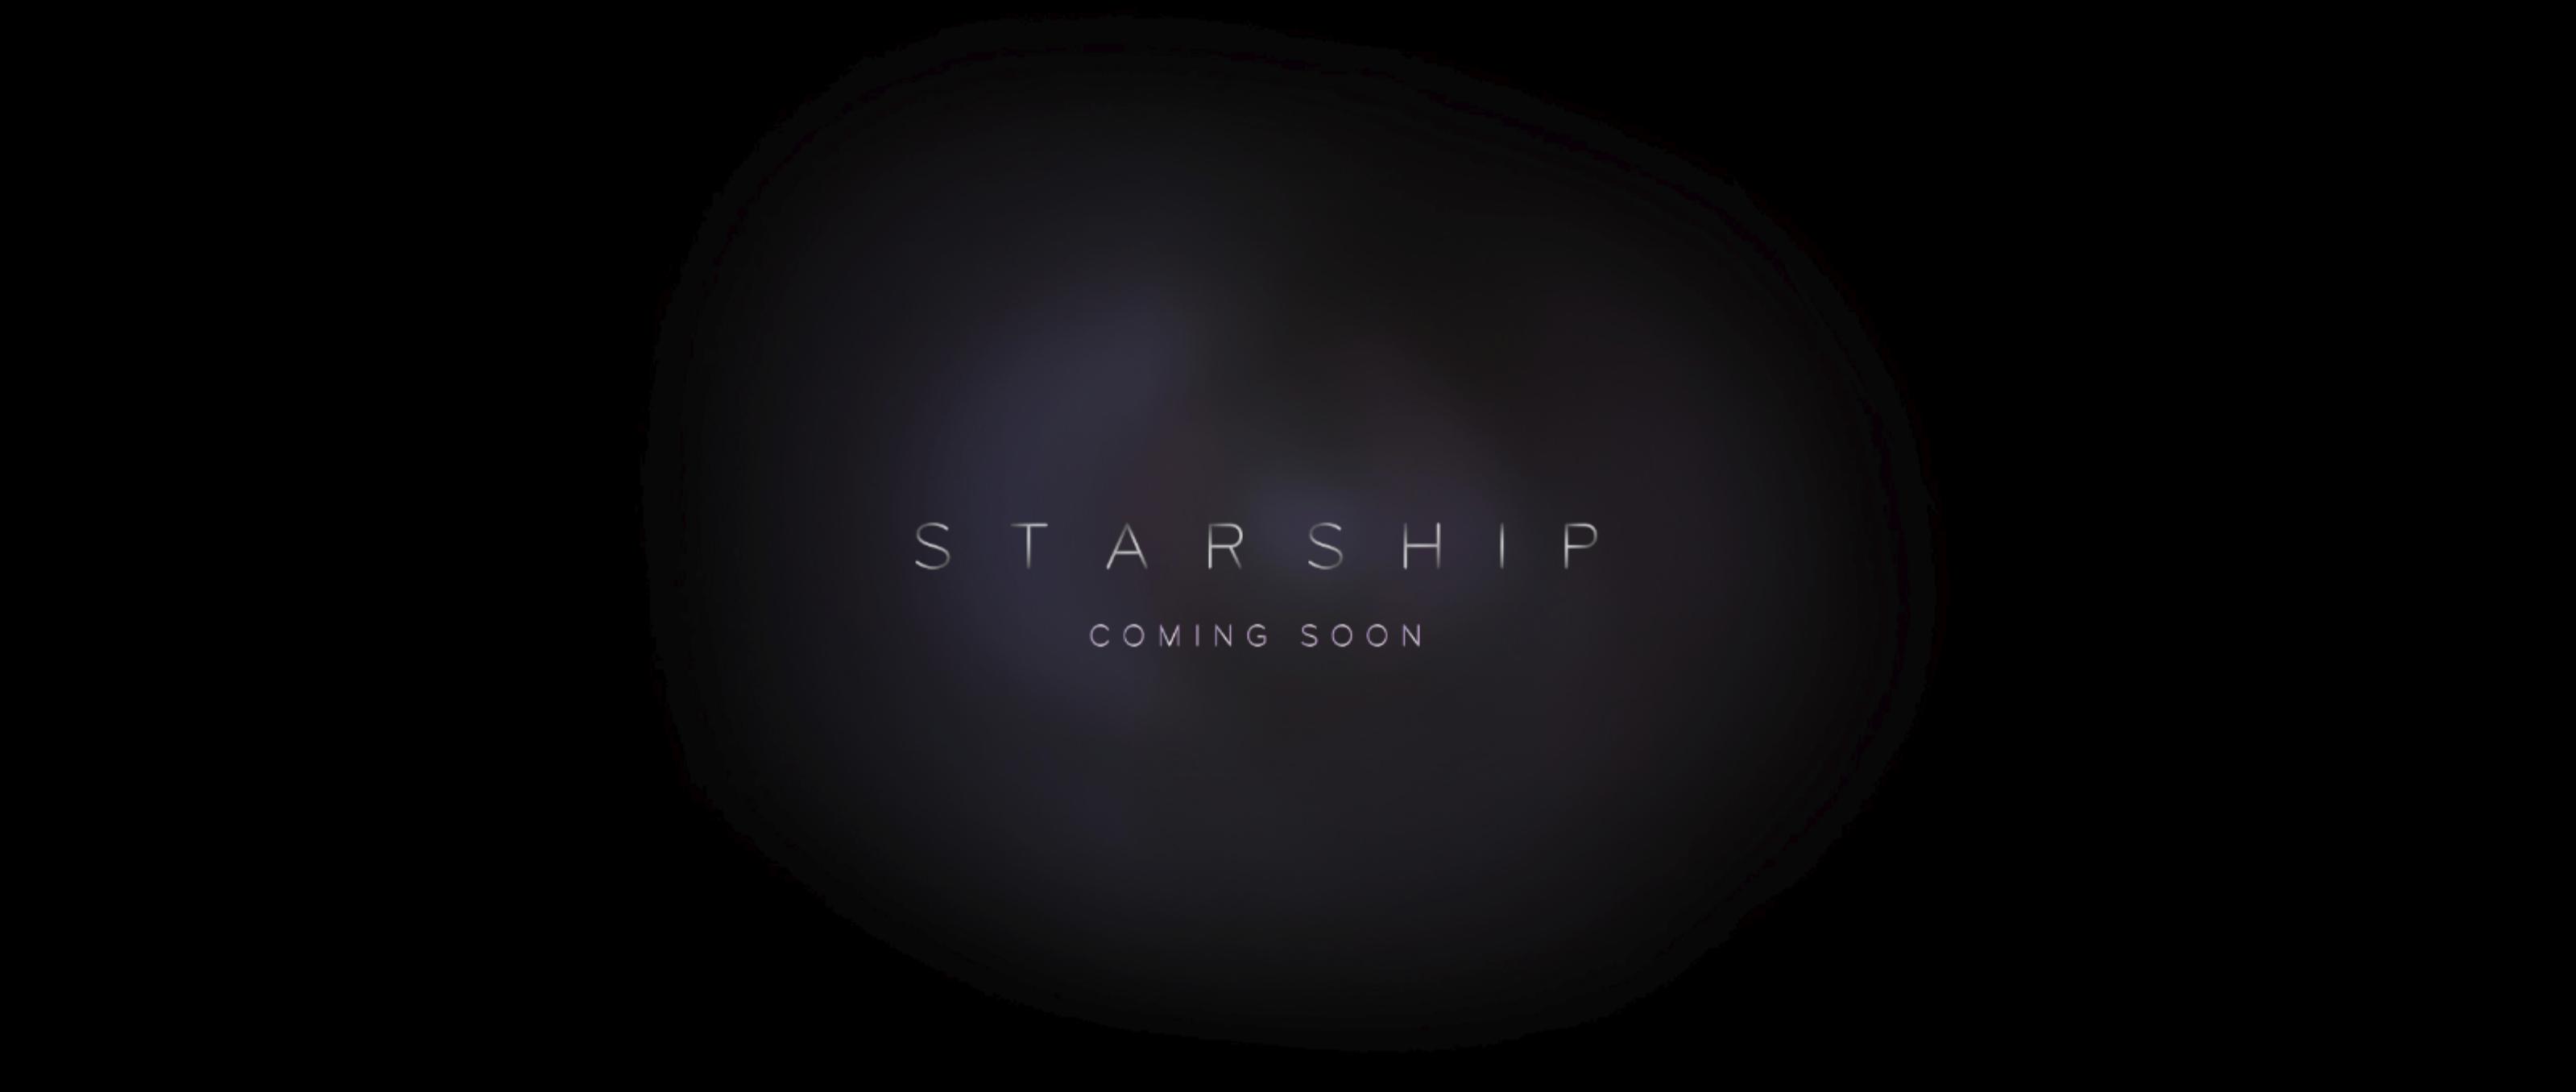 Starship-website-May-2019-Teslarati-1